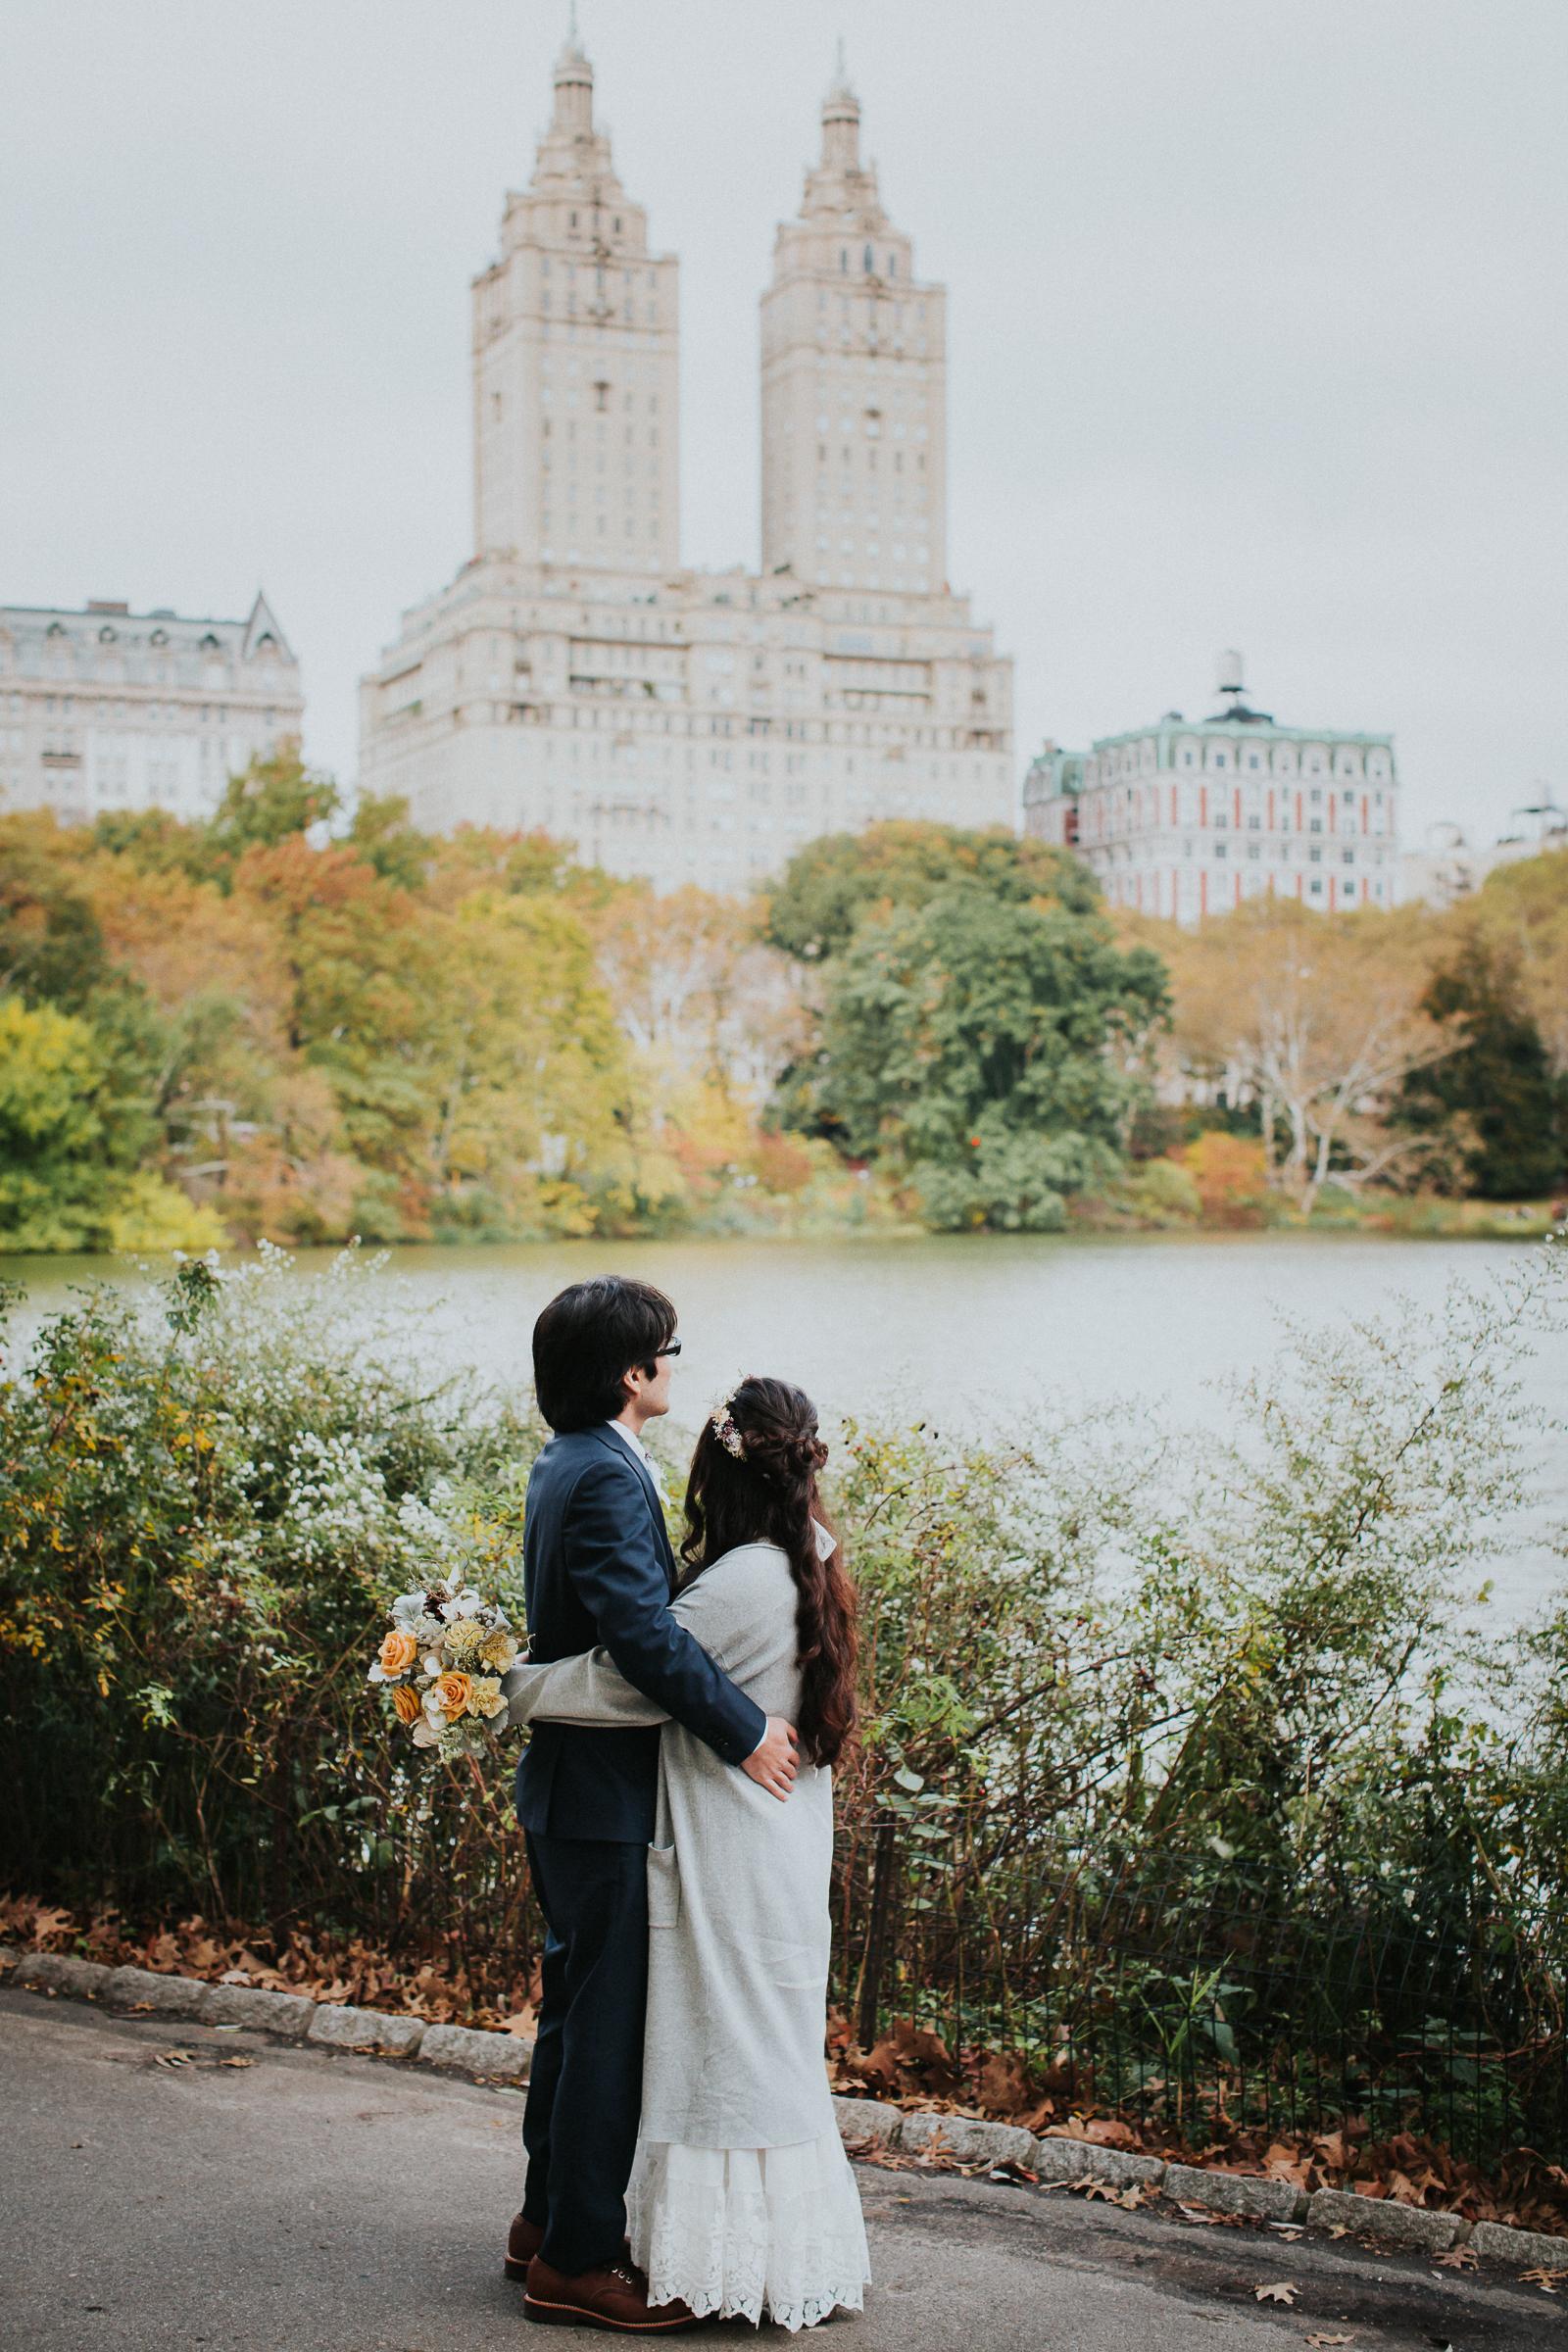 Central-Park-Brooklyn-Bridge-Dumbo-NYC-Documentary-Wedding-Photographer-35.jpg